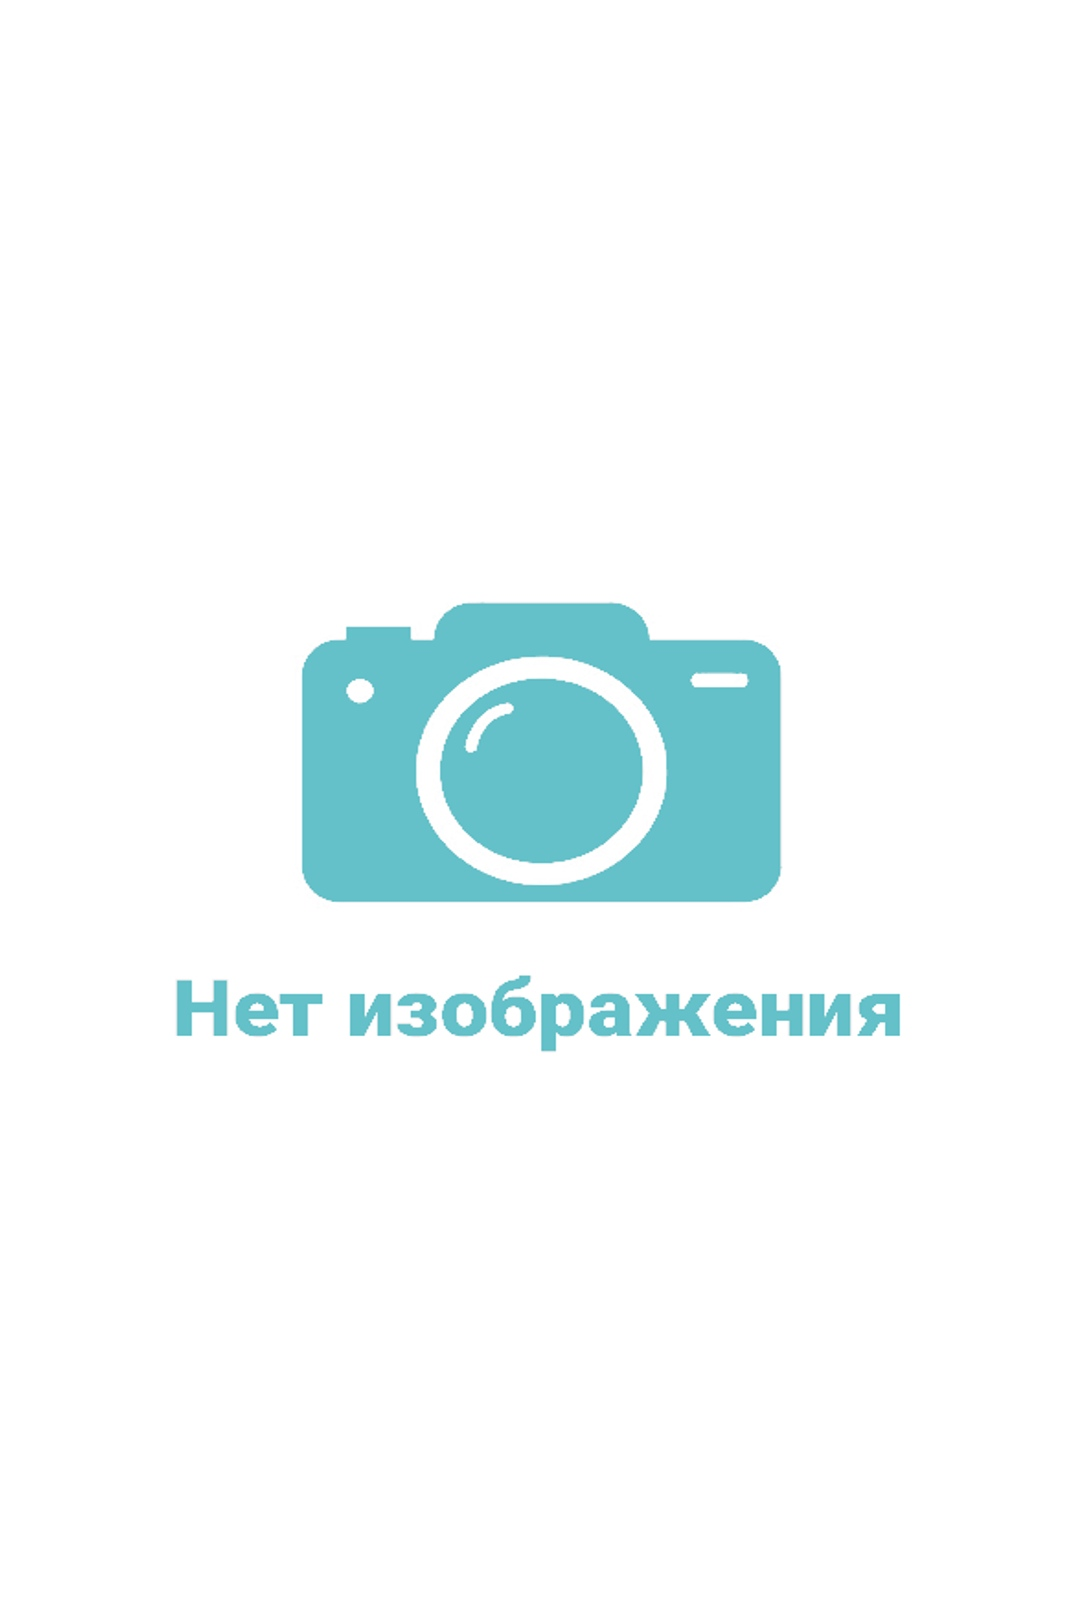 Врач нейрохирург Козачук Юрий Валерьевич